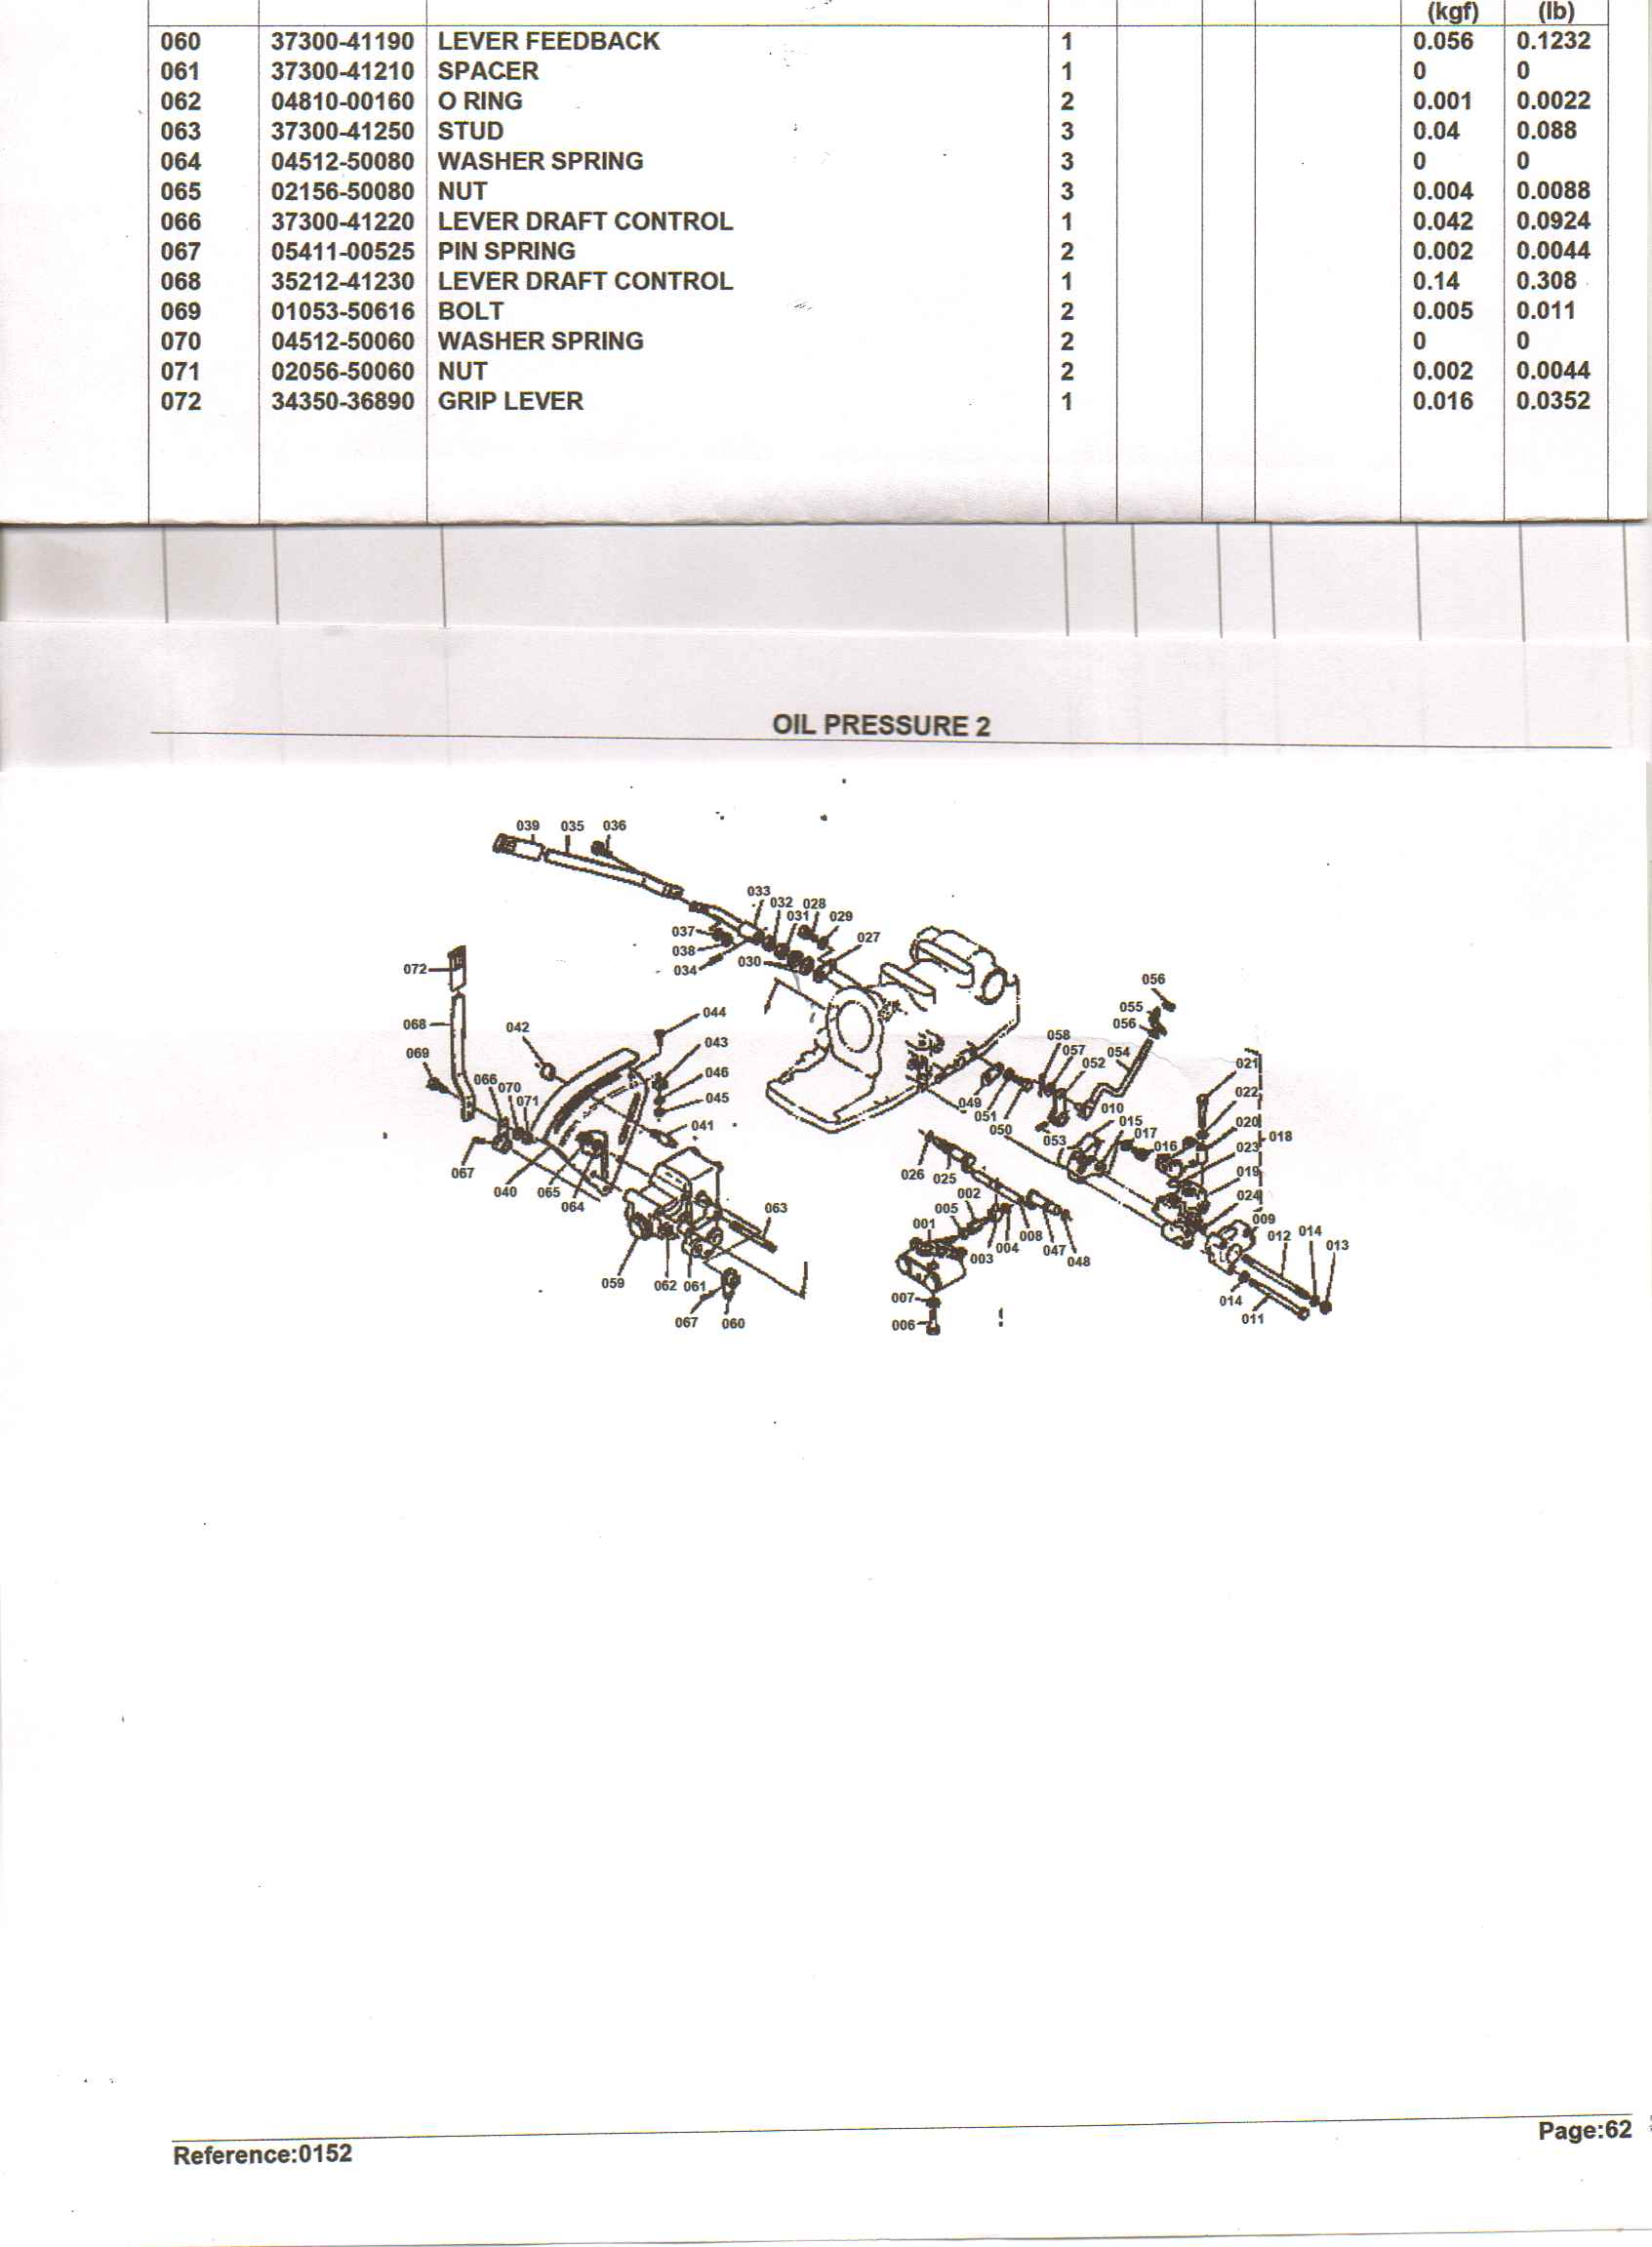 I Have A Kubota L345 The Hydraulic Lift Was Working Fine